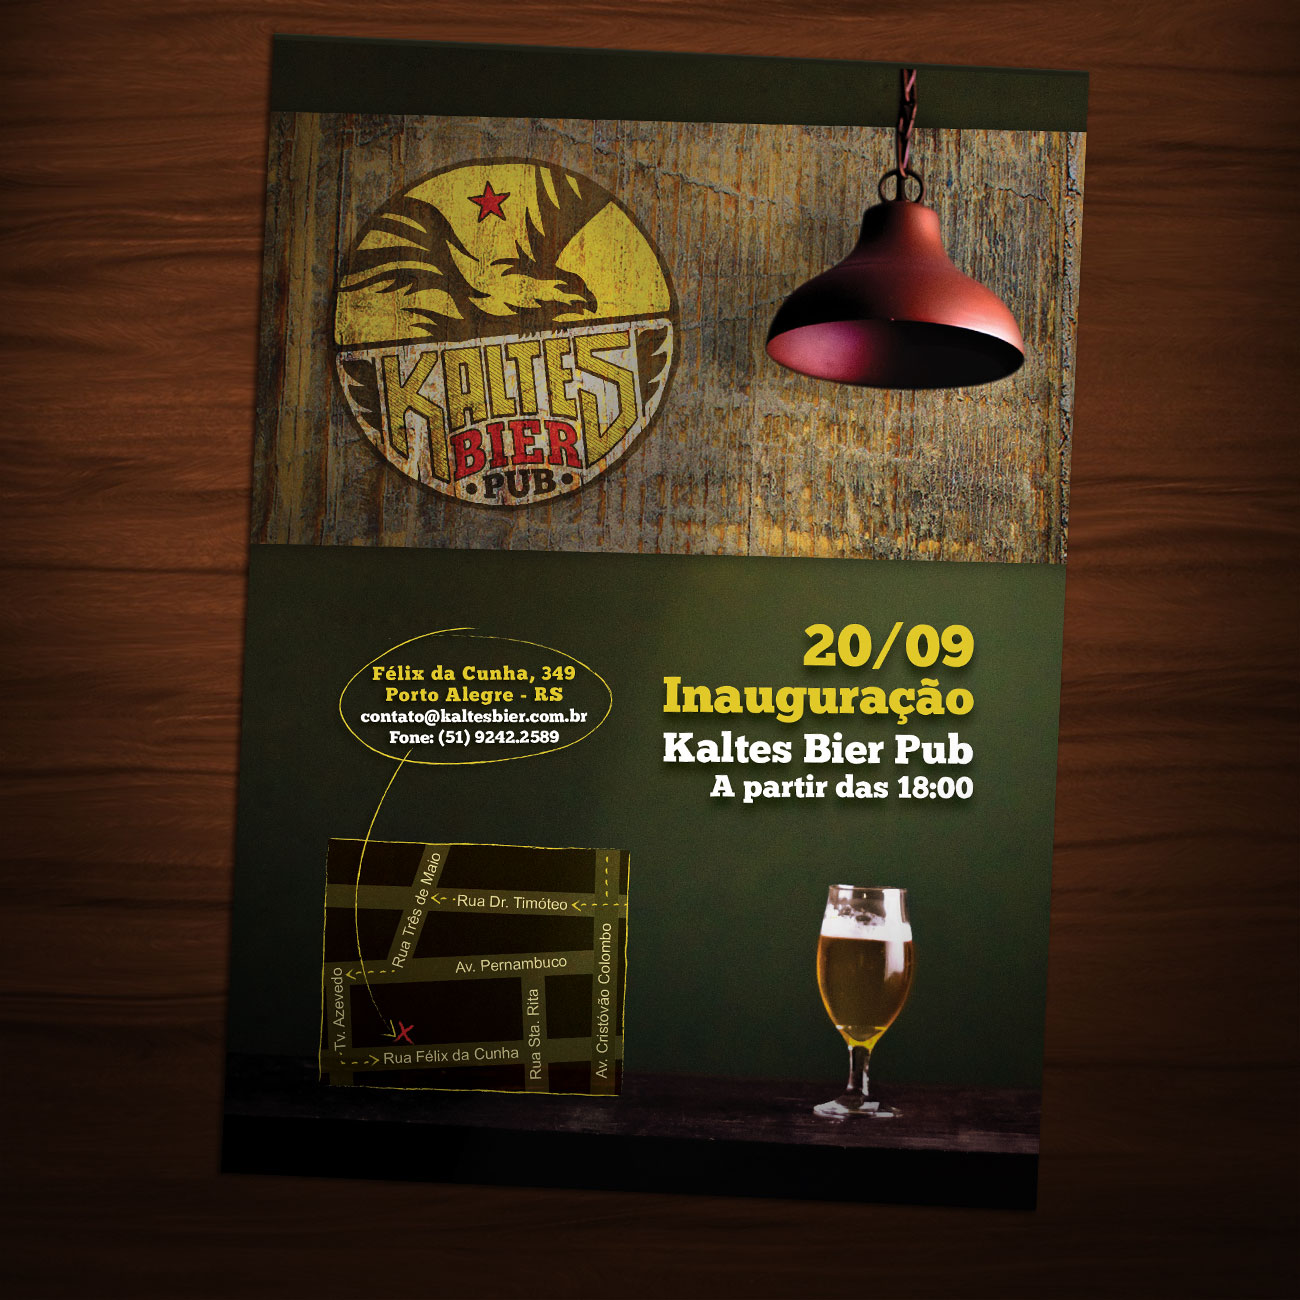 Flyer Kaltes Bier Pub